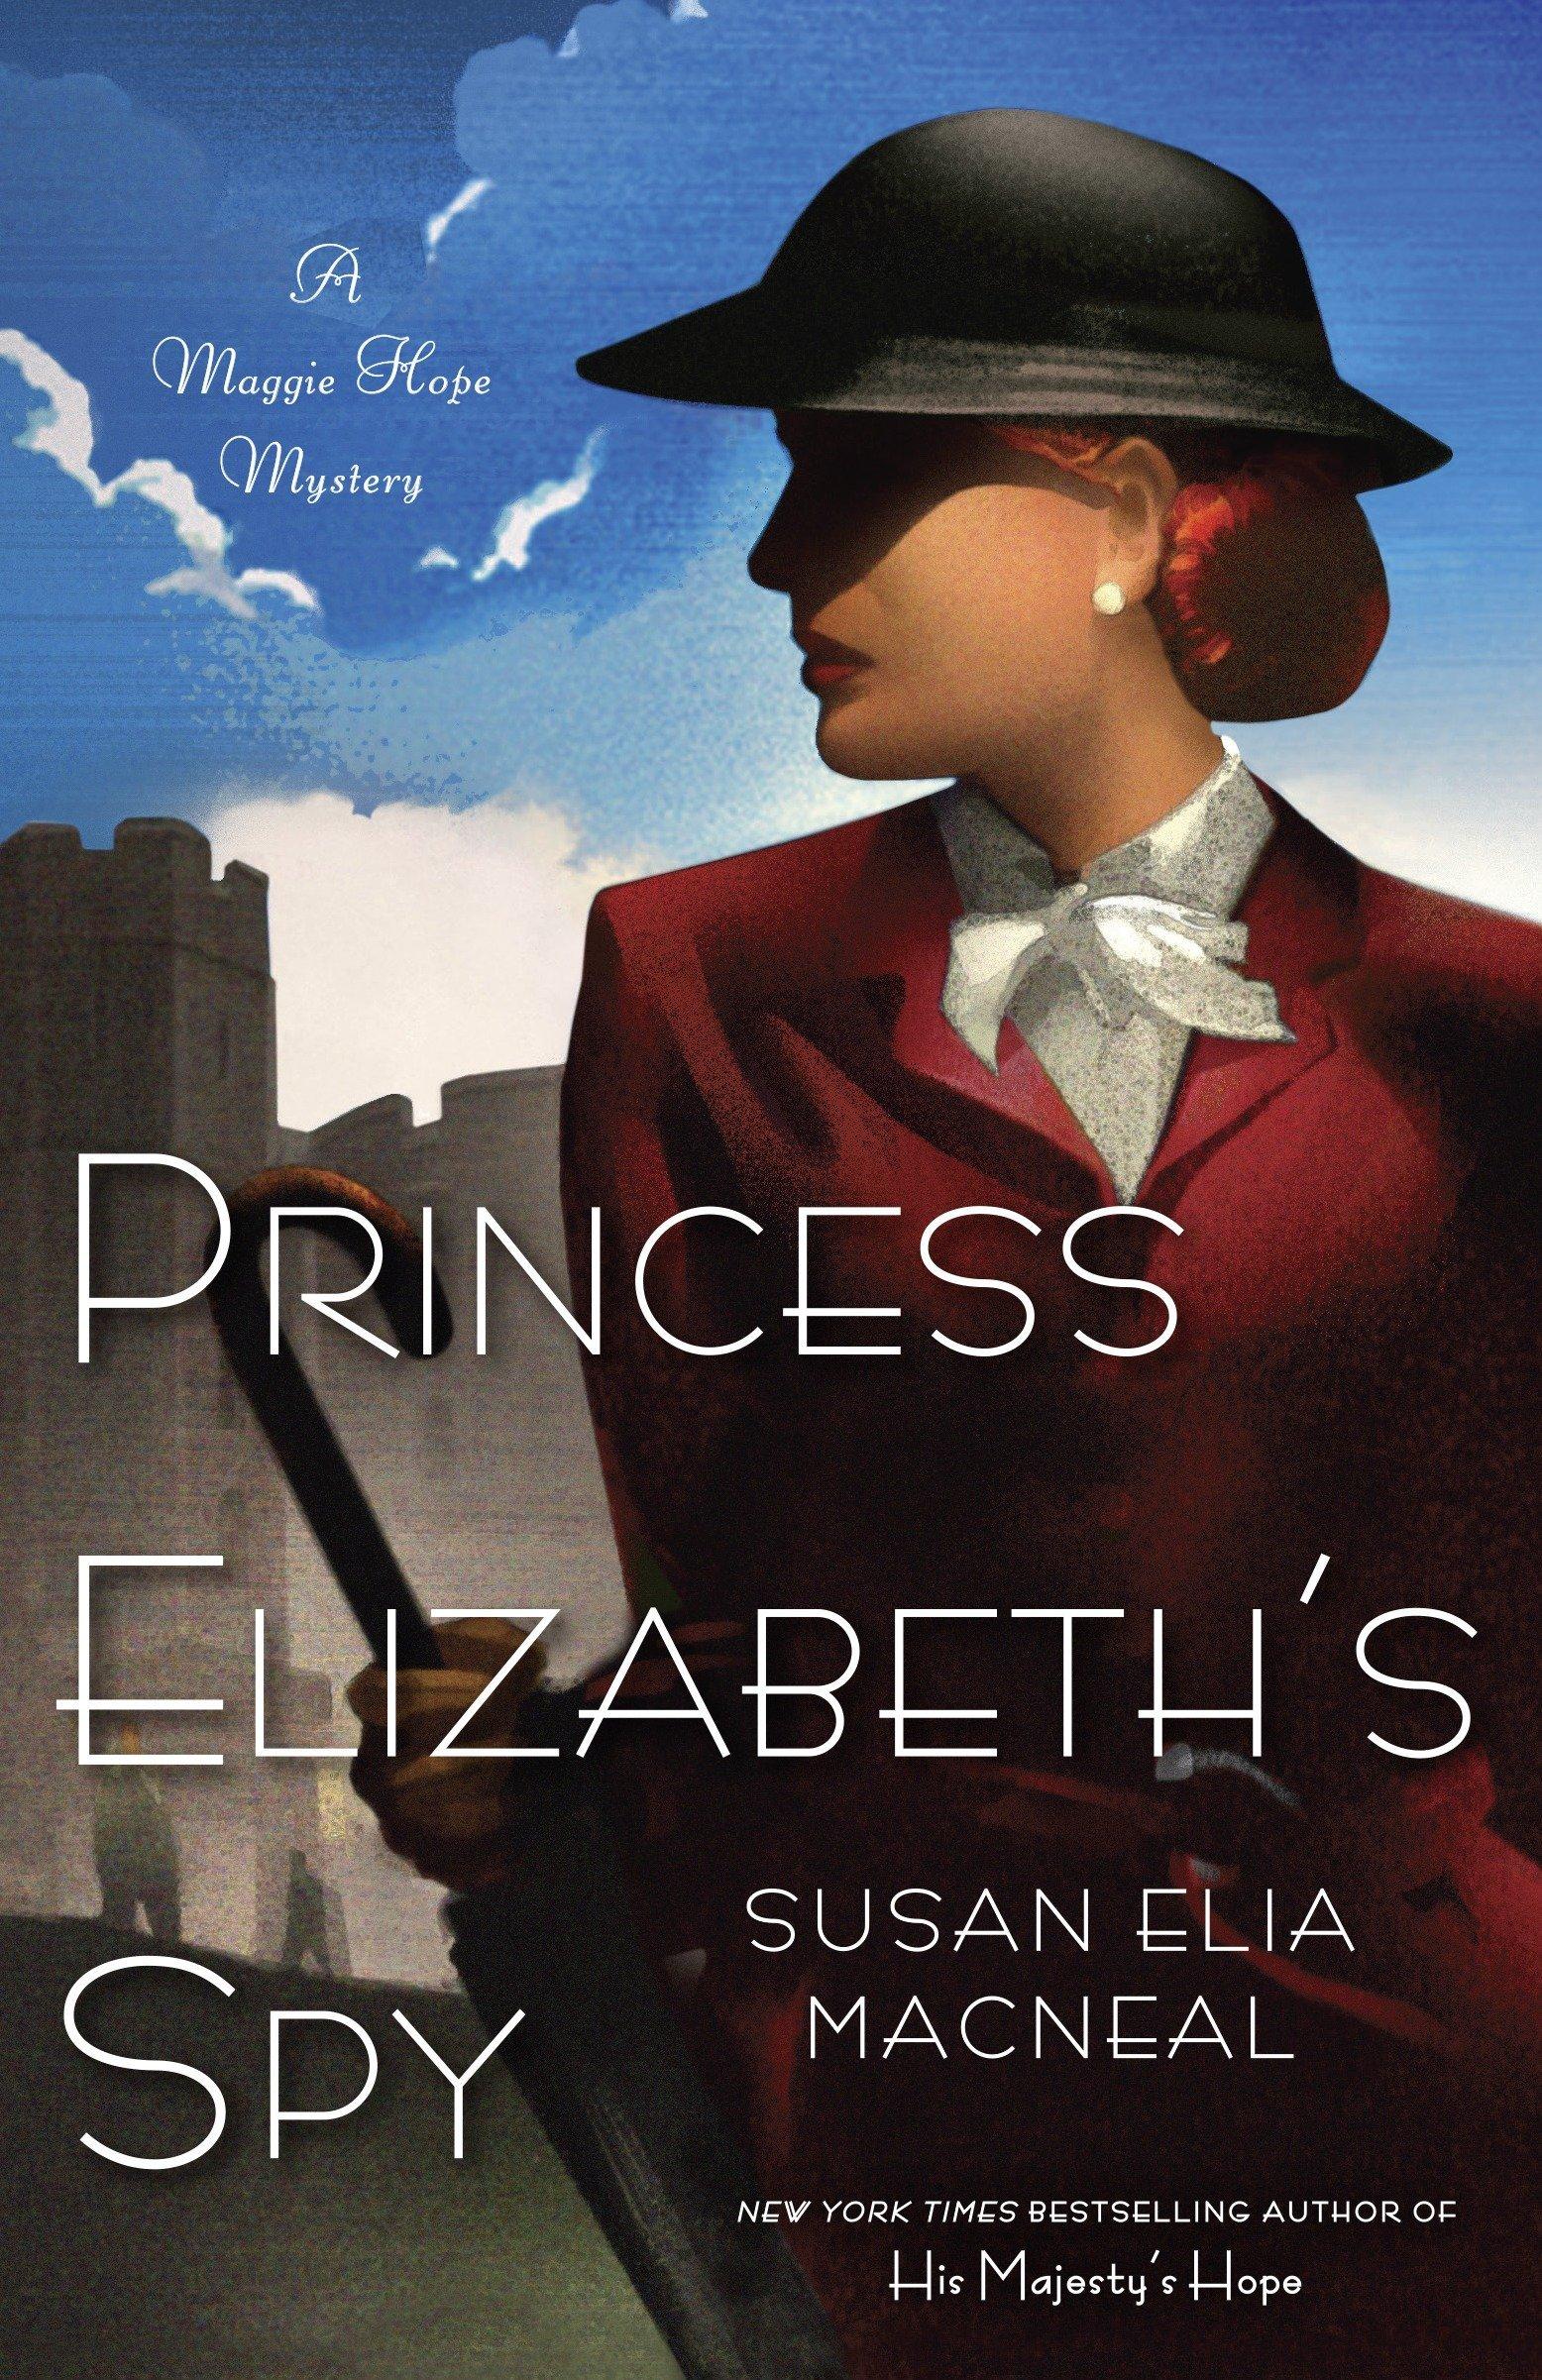 53884e51471 Princess Elizabeth s Spy - Livros na Amazon Brasil- 8601400455470